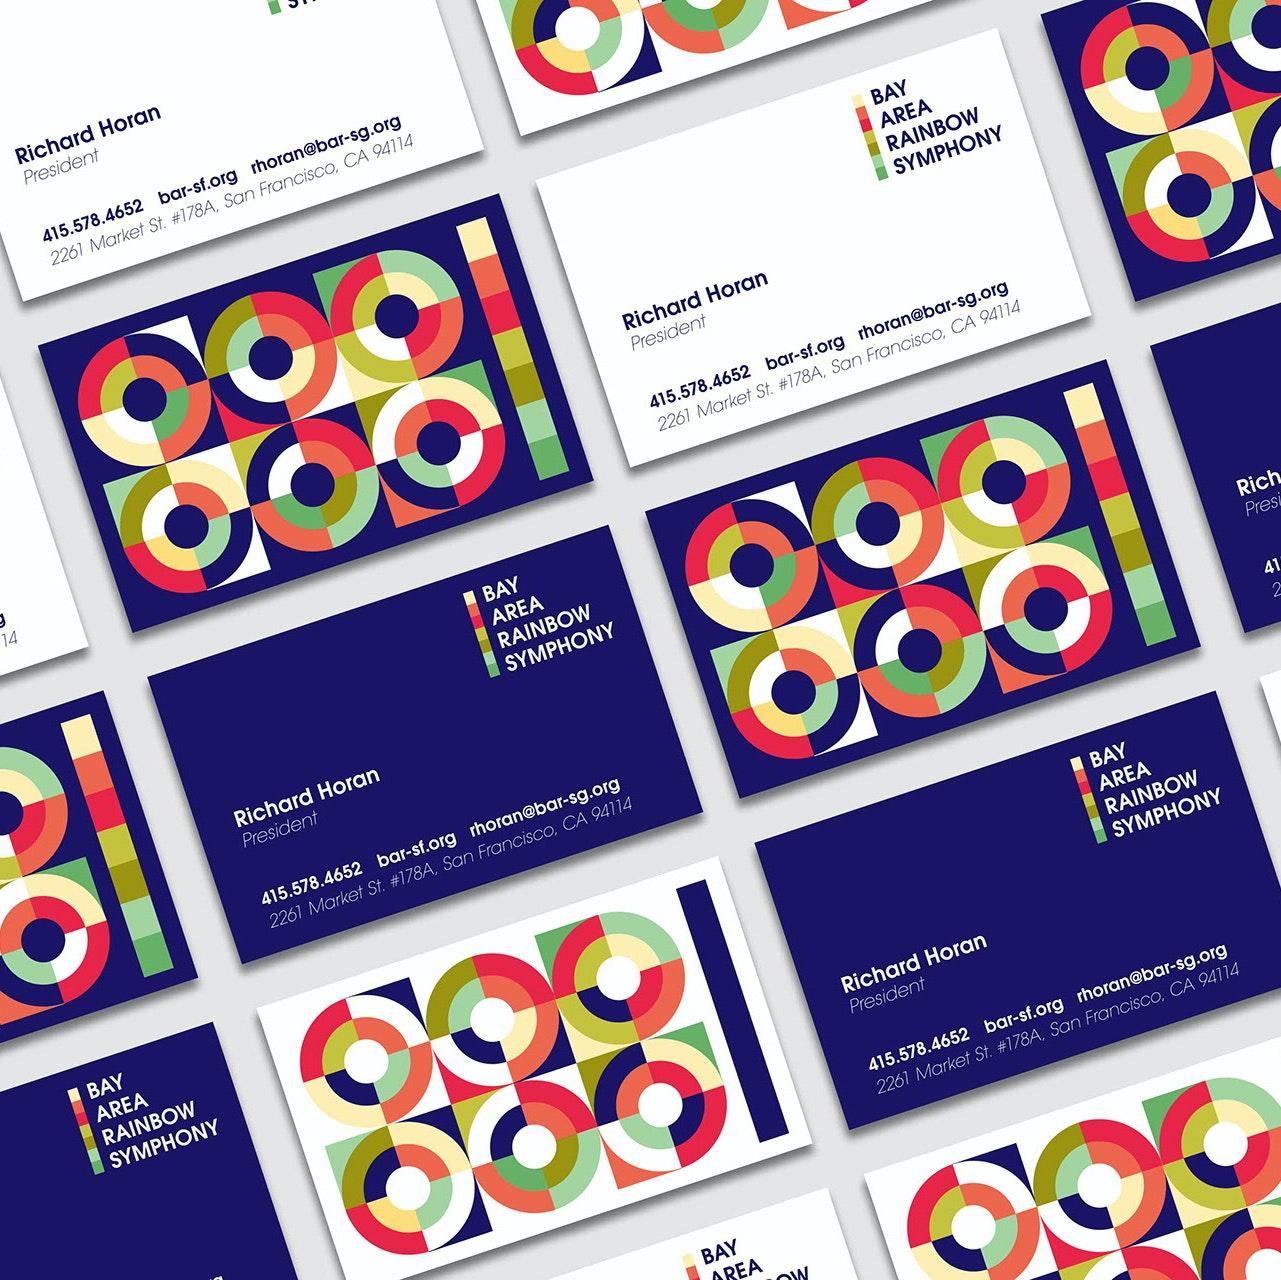 Brand identity design for the Bay Area Rainbow Symphony